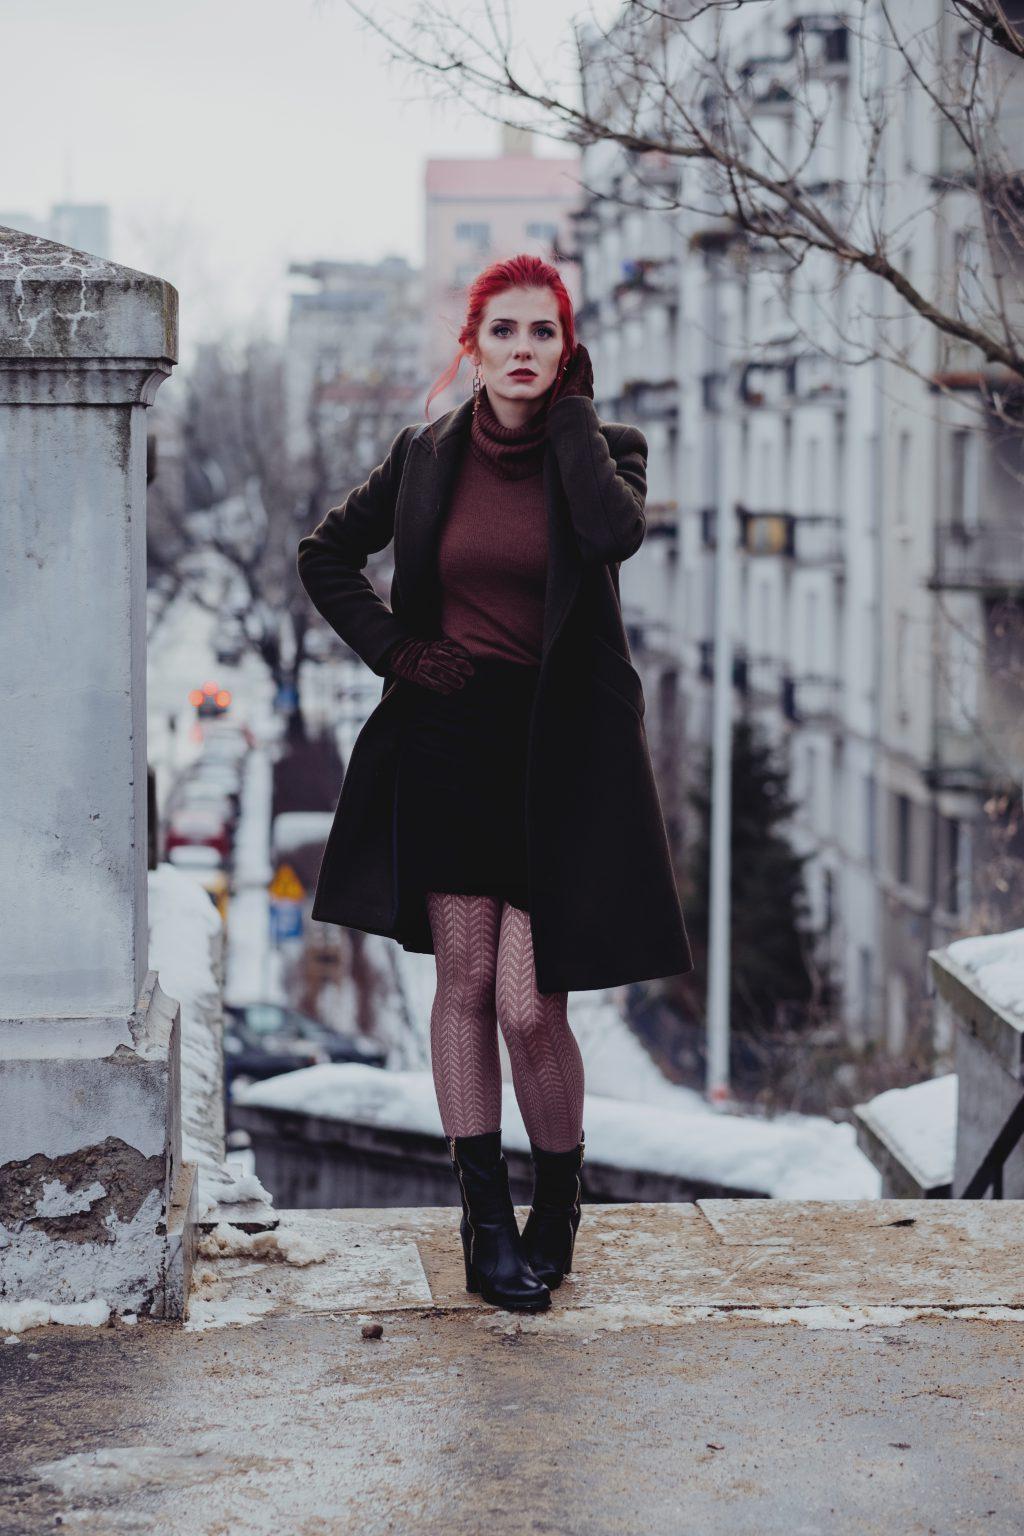 Redhead woman posing in th city - free stock photo